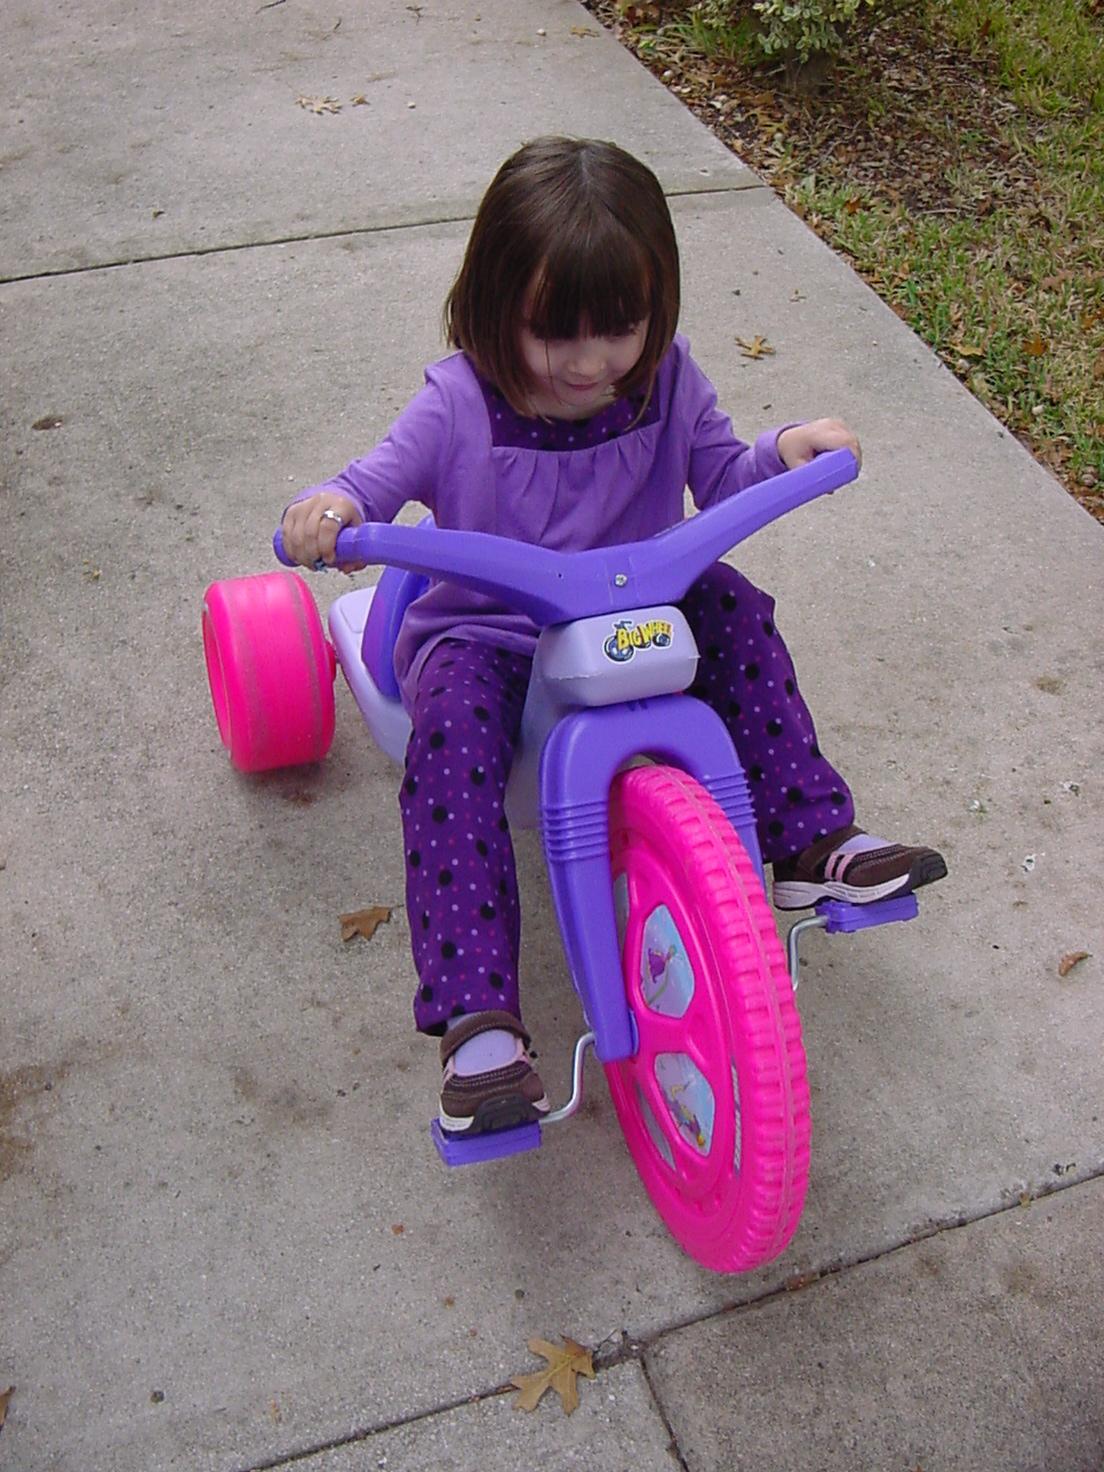 2008-11-27-big-wheels-13.JPG